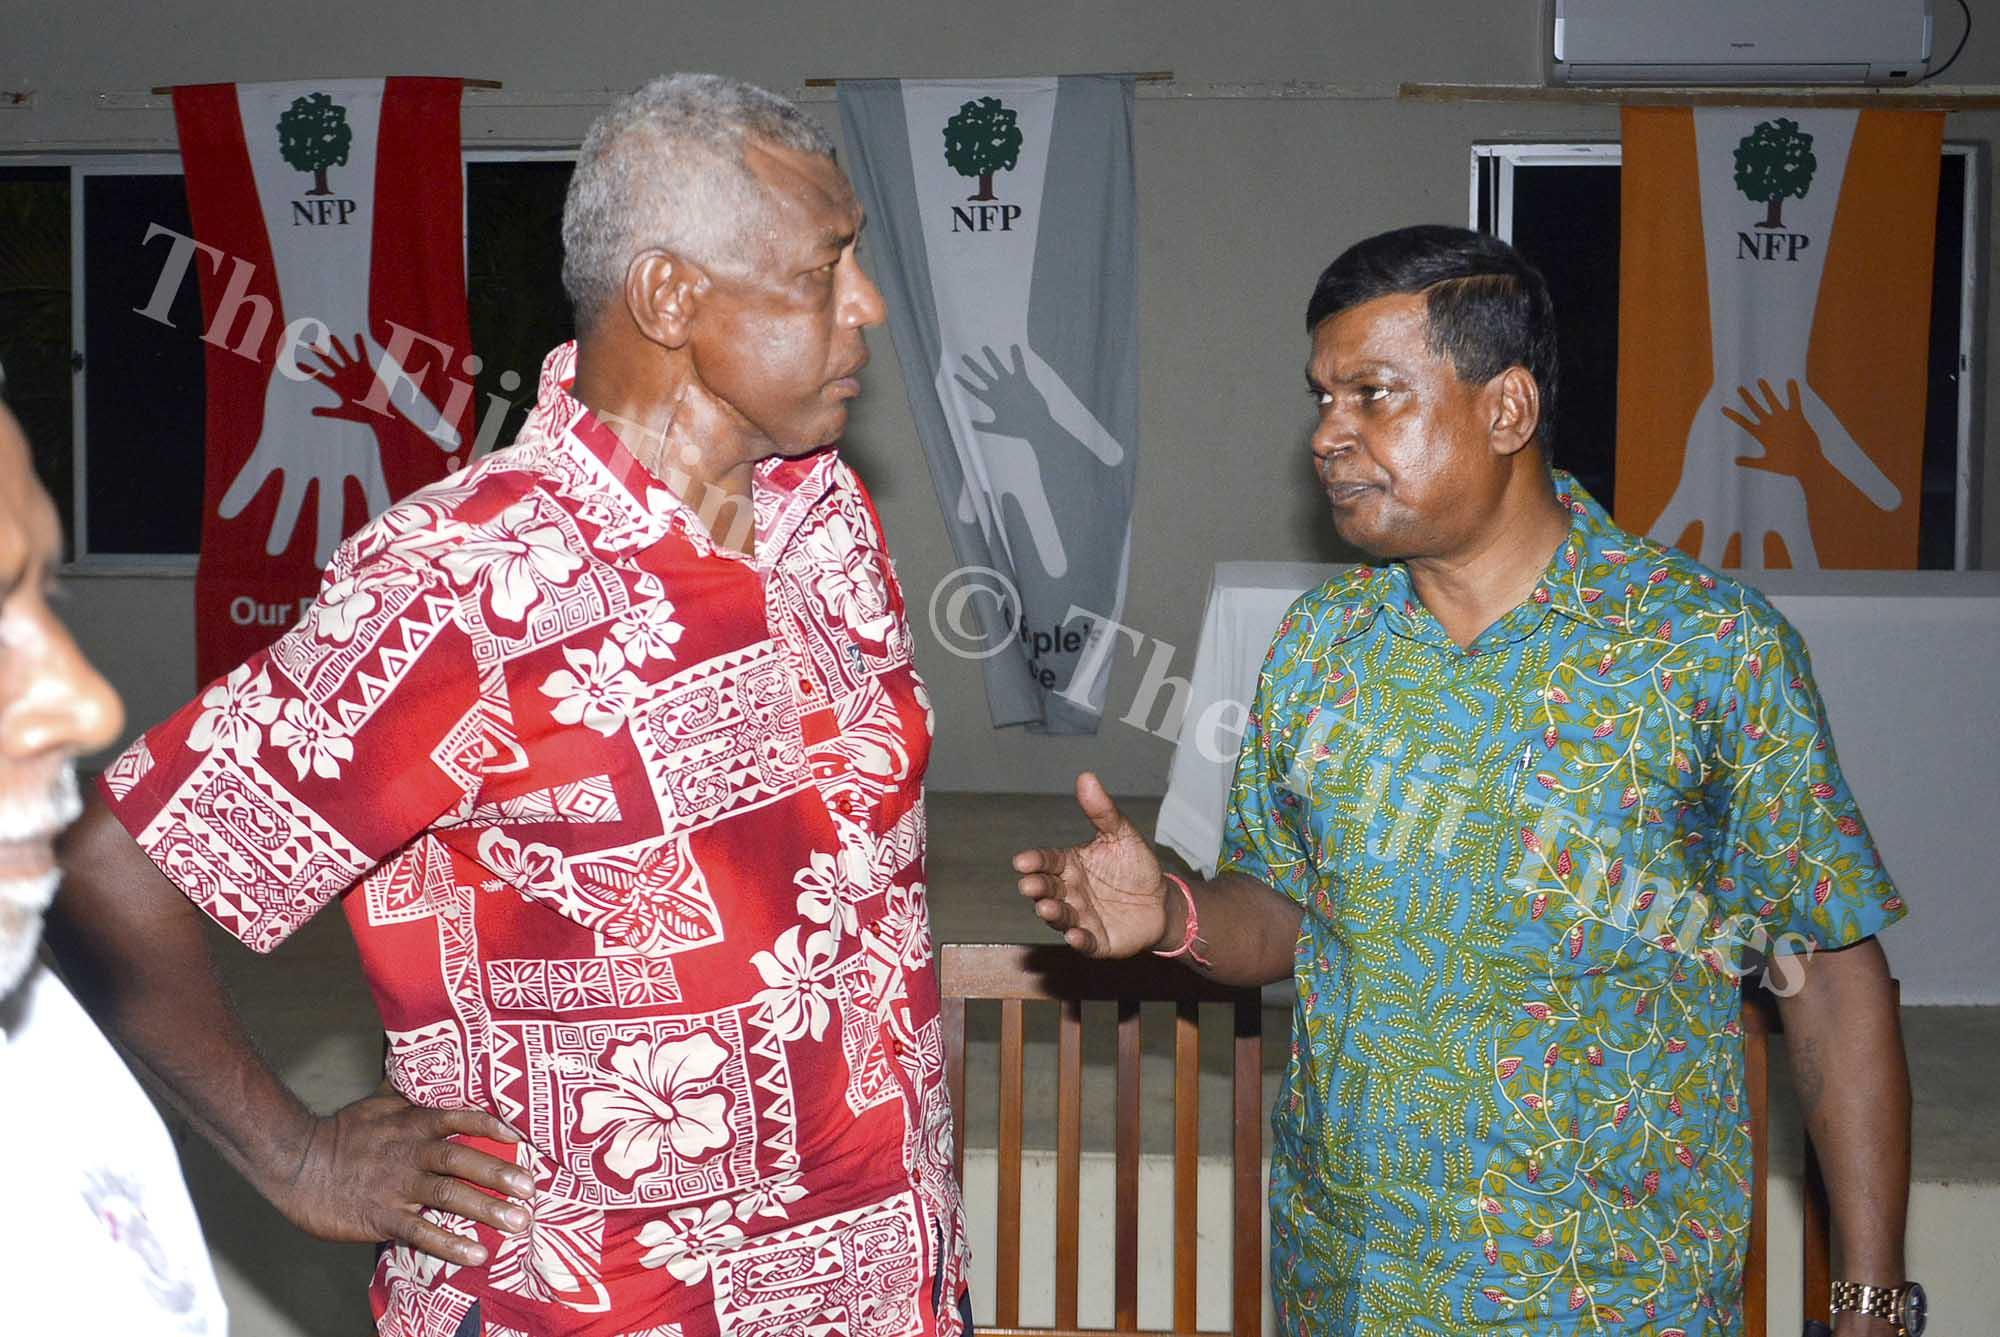 Pio Tikoduadua (left) with  NFP leader Biman Prasad after the meeting in Nadi. Picture: BALJEET SINGH